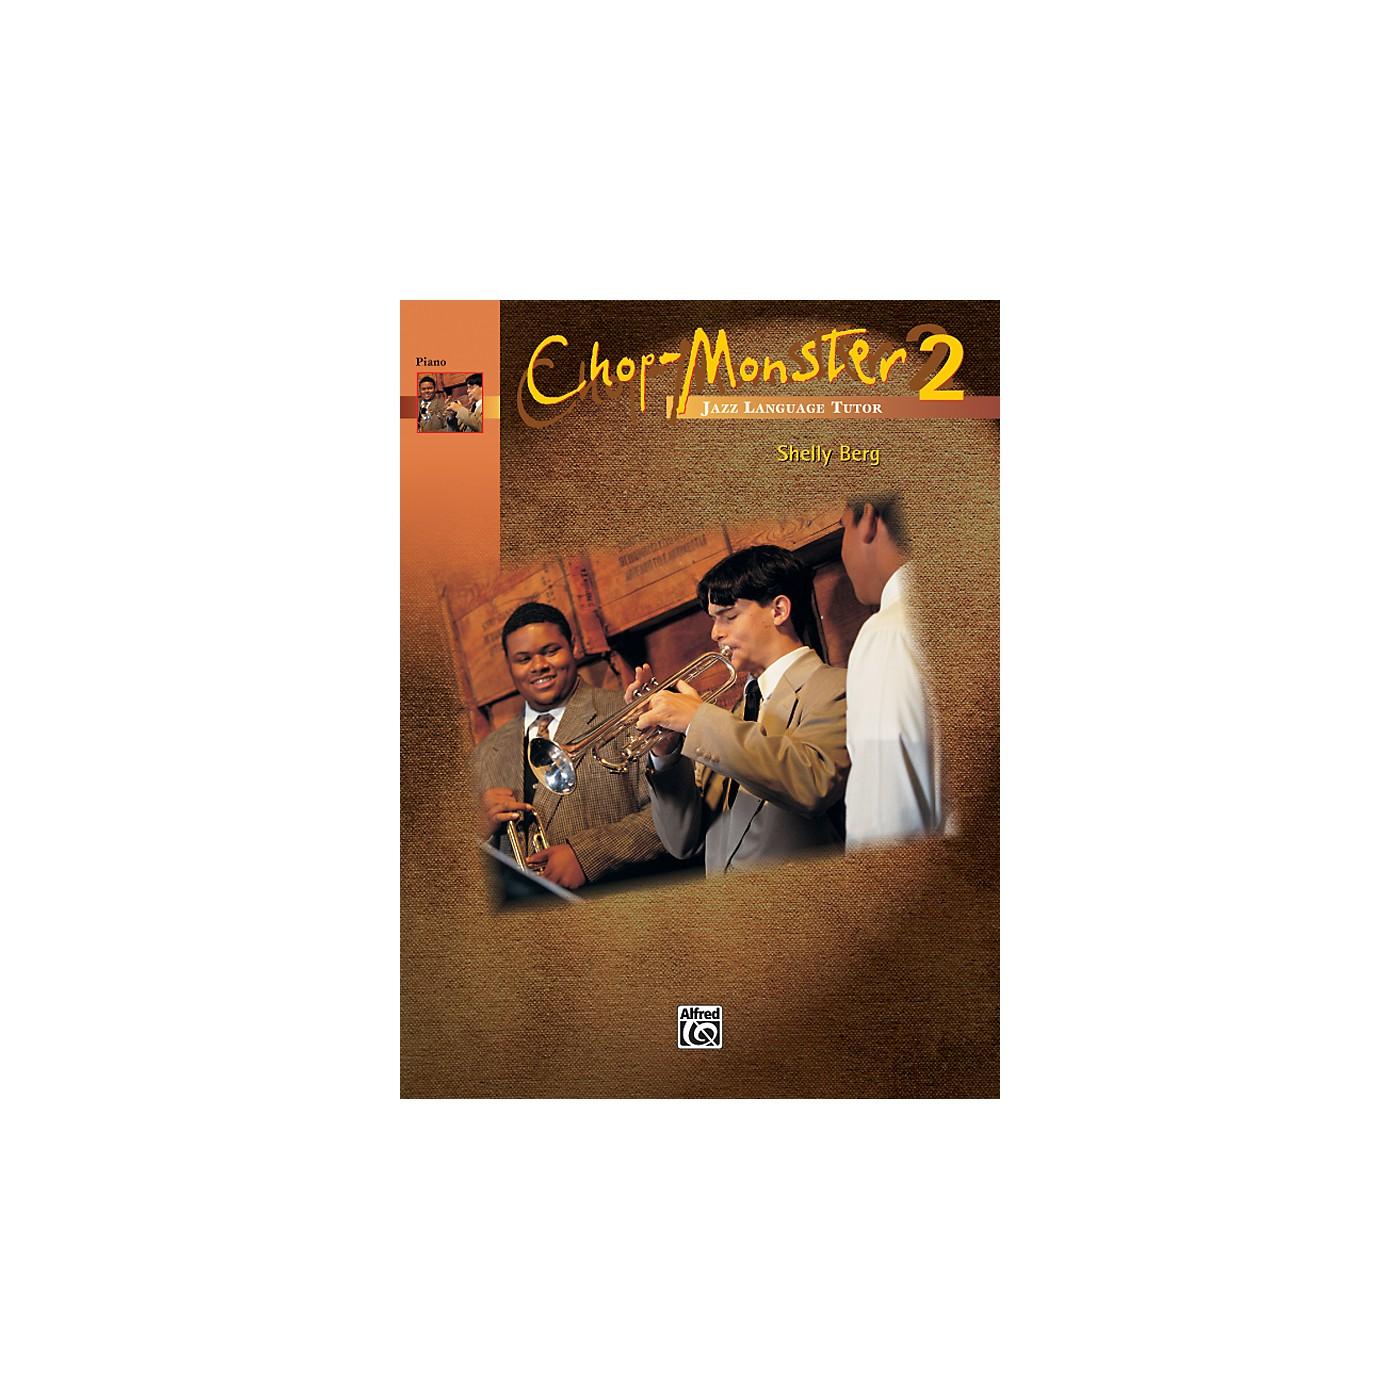 Alfred Chop-Monster Book 2 Piano Book thumbnail